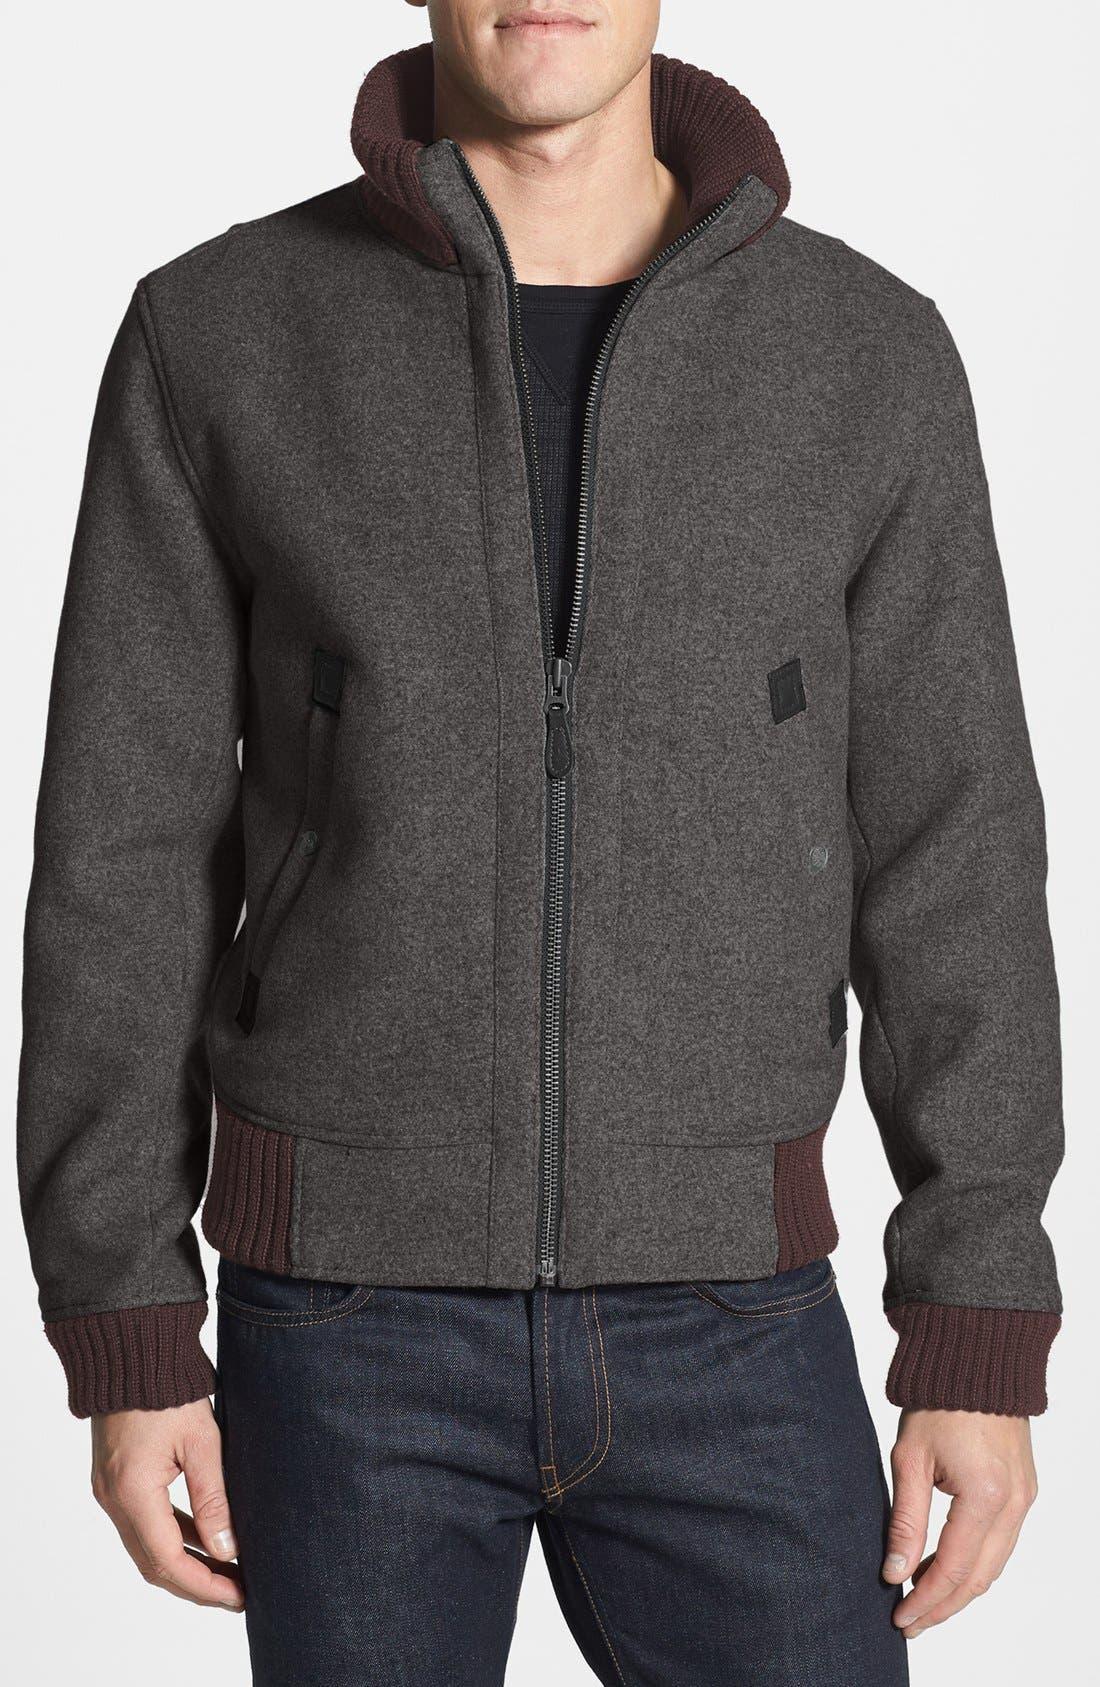 Main Image - Spiewak 'Franklin' Wool Blend Jacket